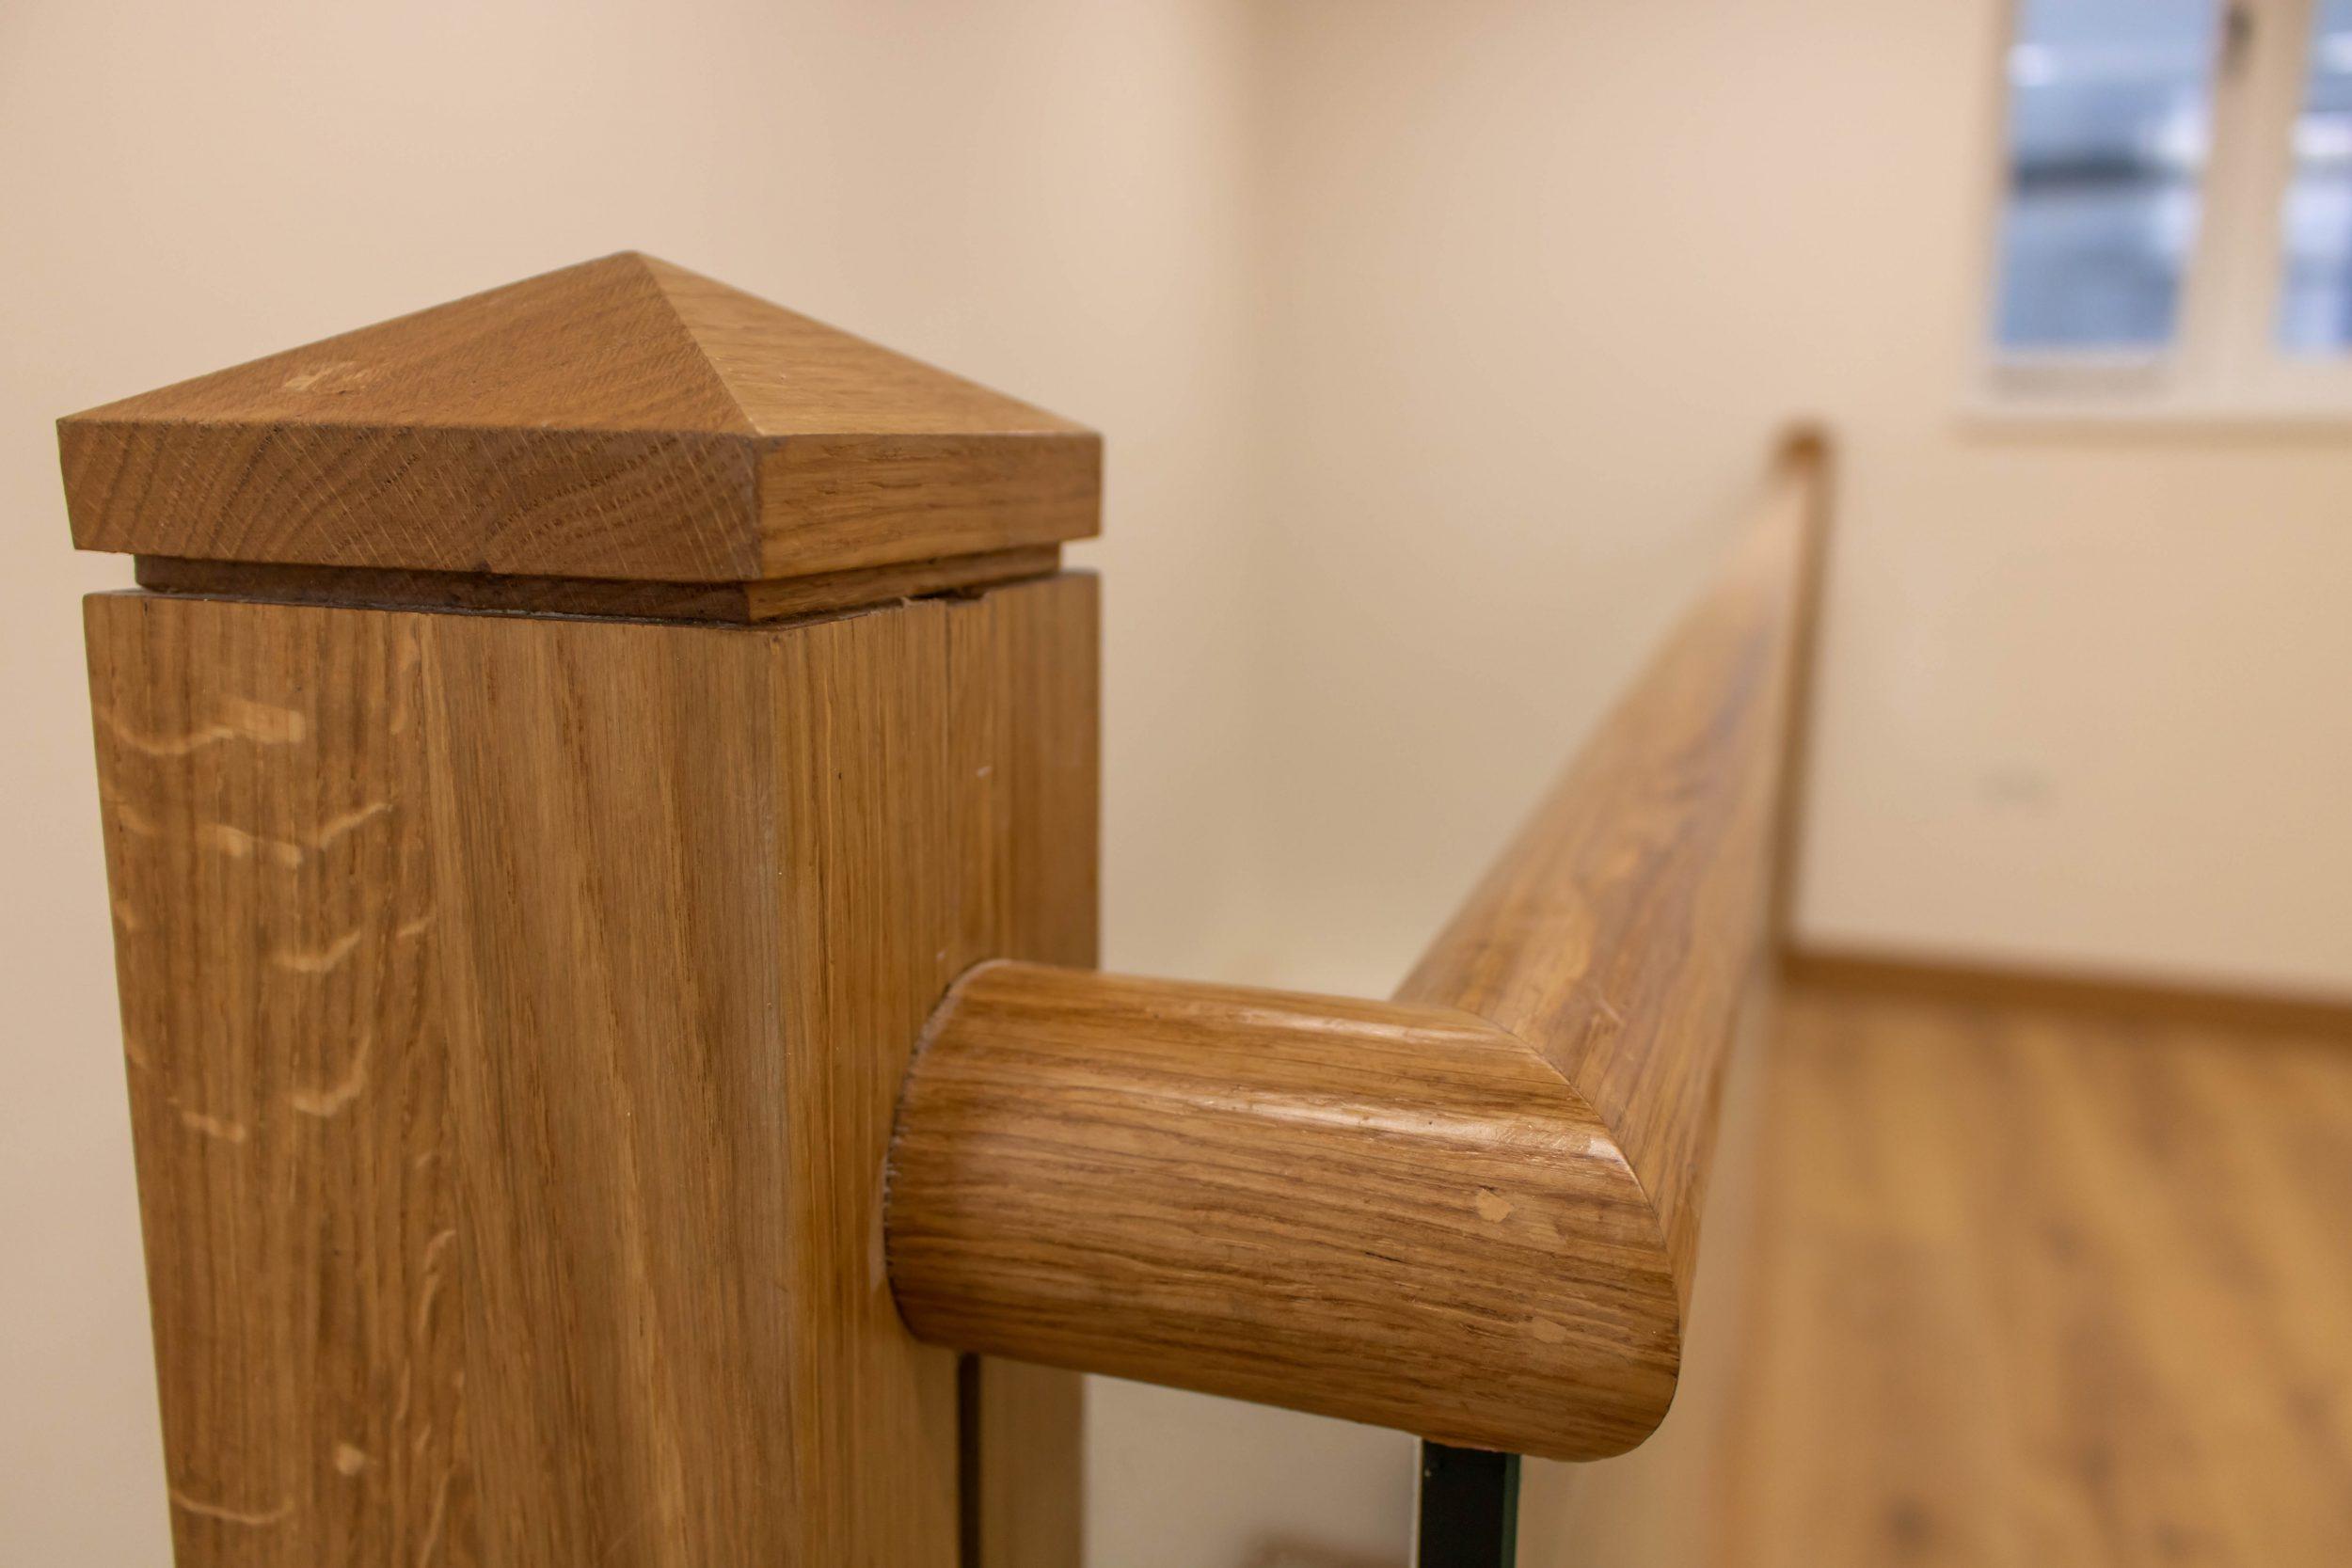 Kandd handrail design